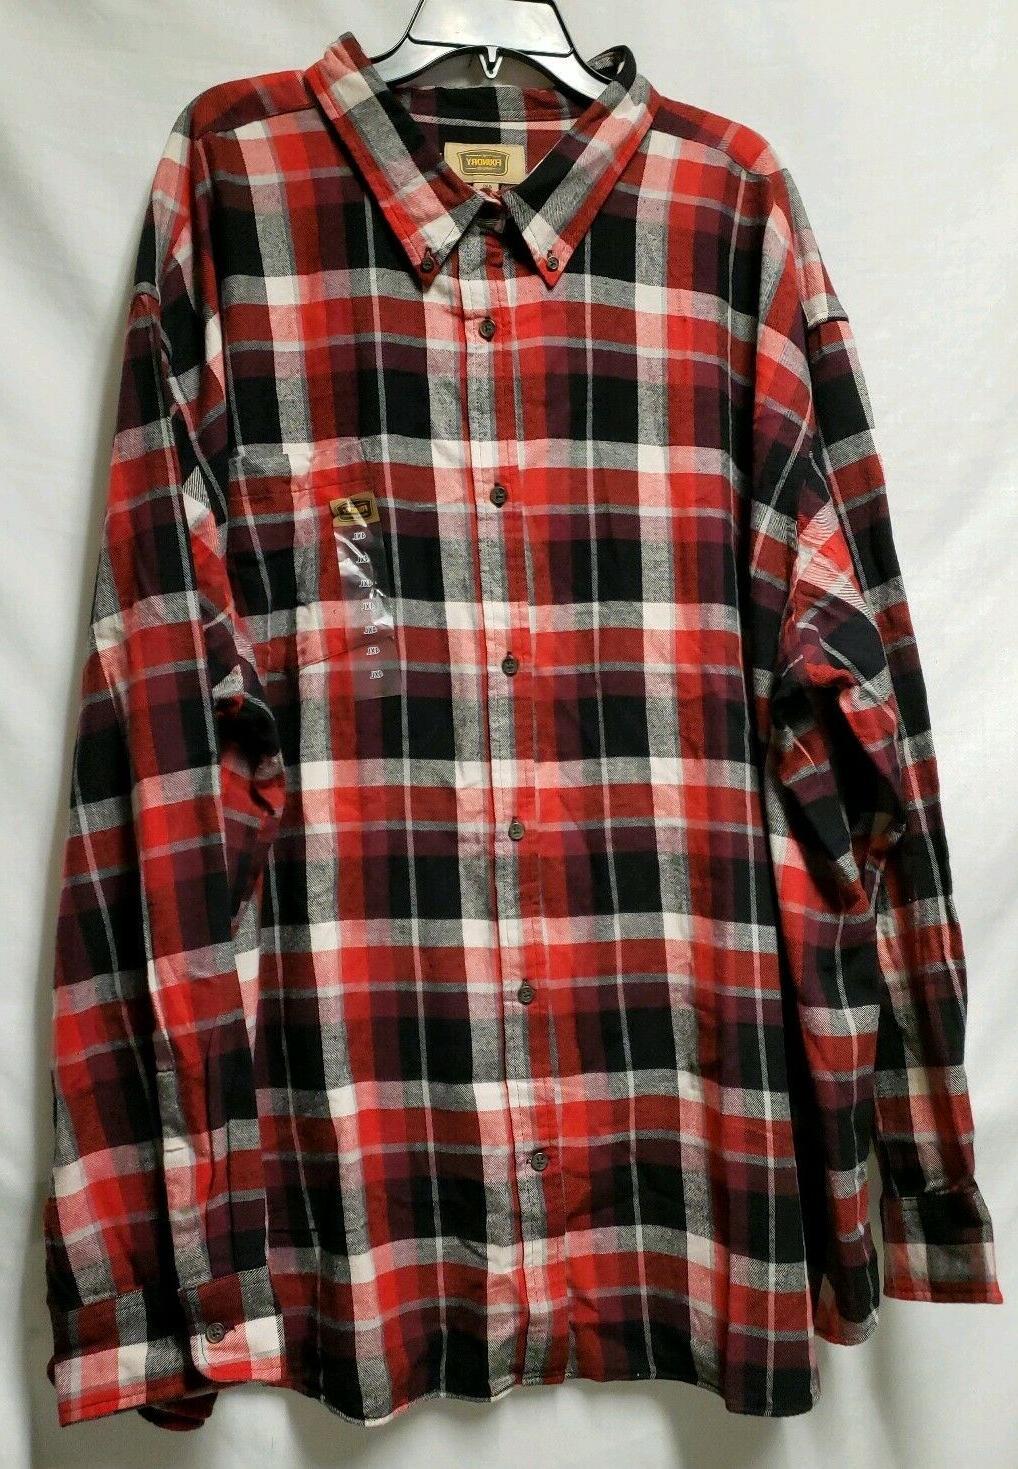 NWT & FLANNEL Size Red Black PLAID $40